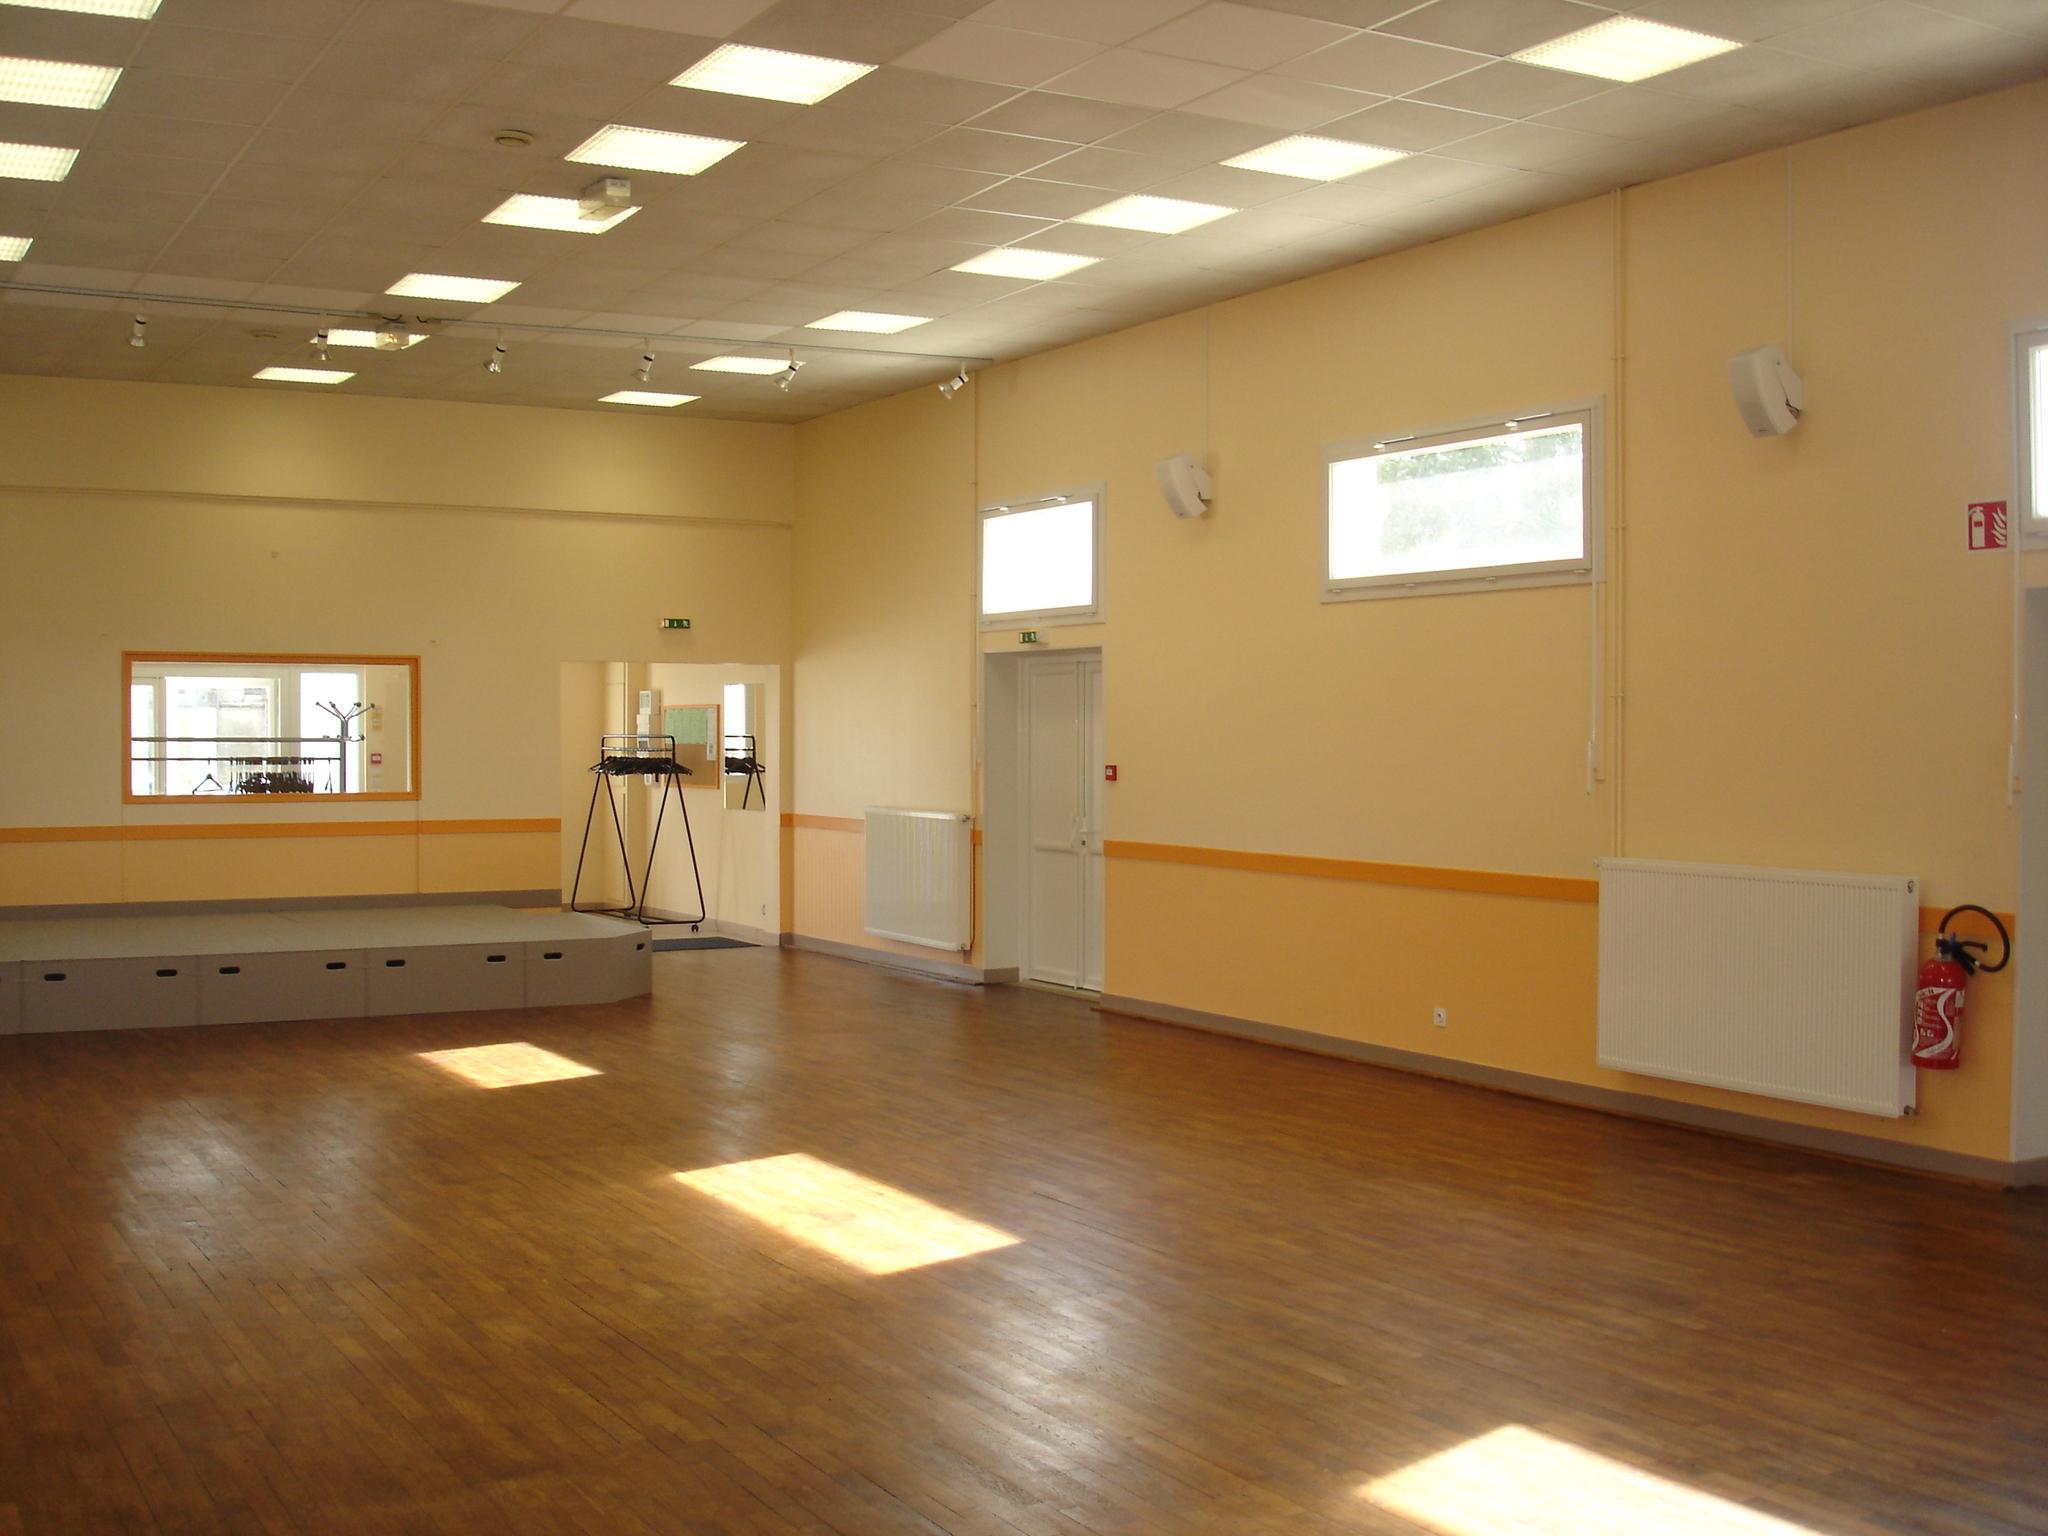 Centre socio culturel Auverse